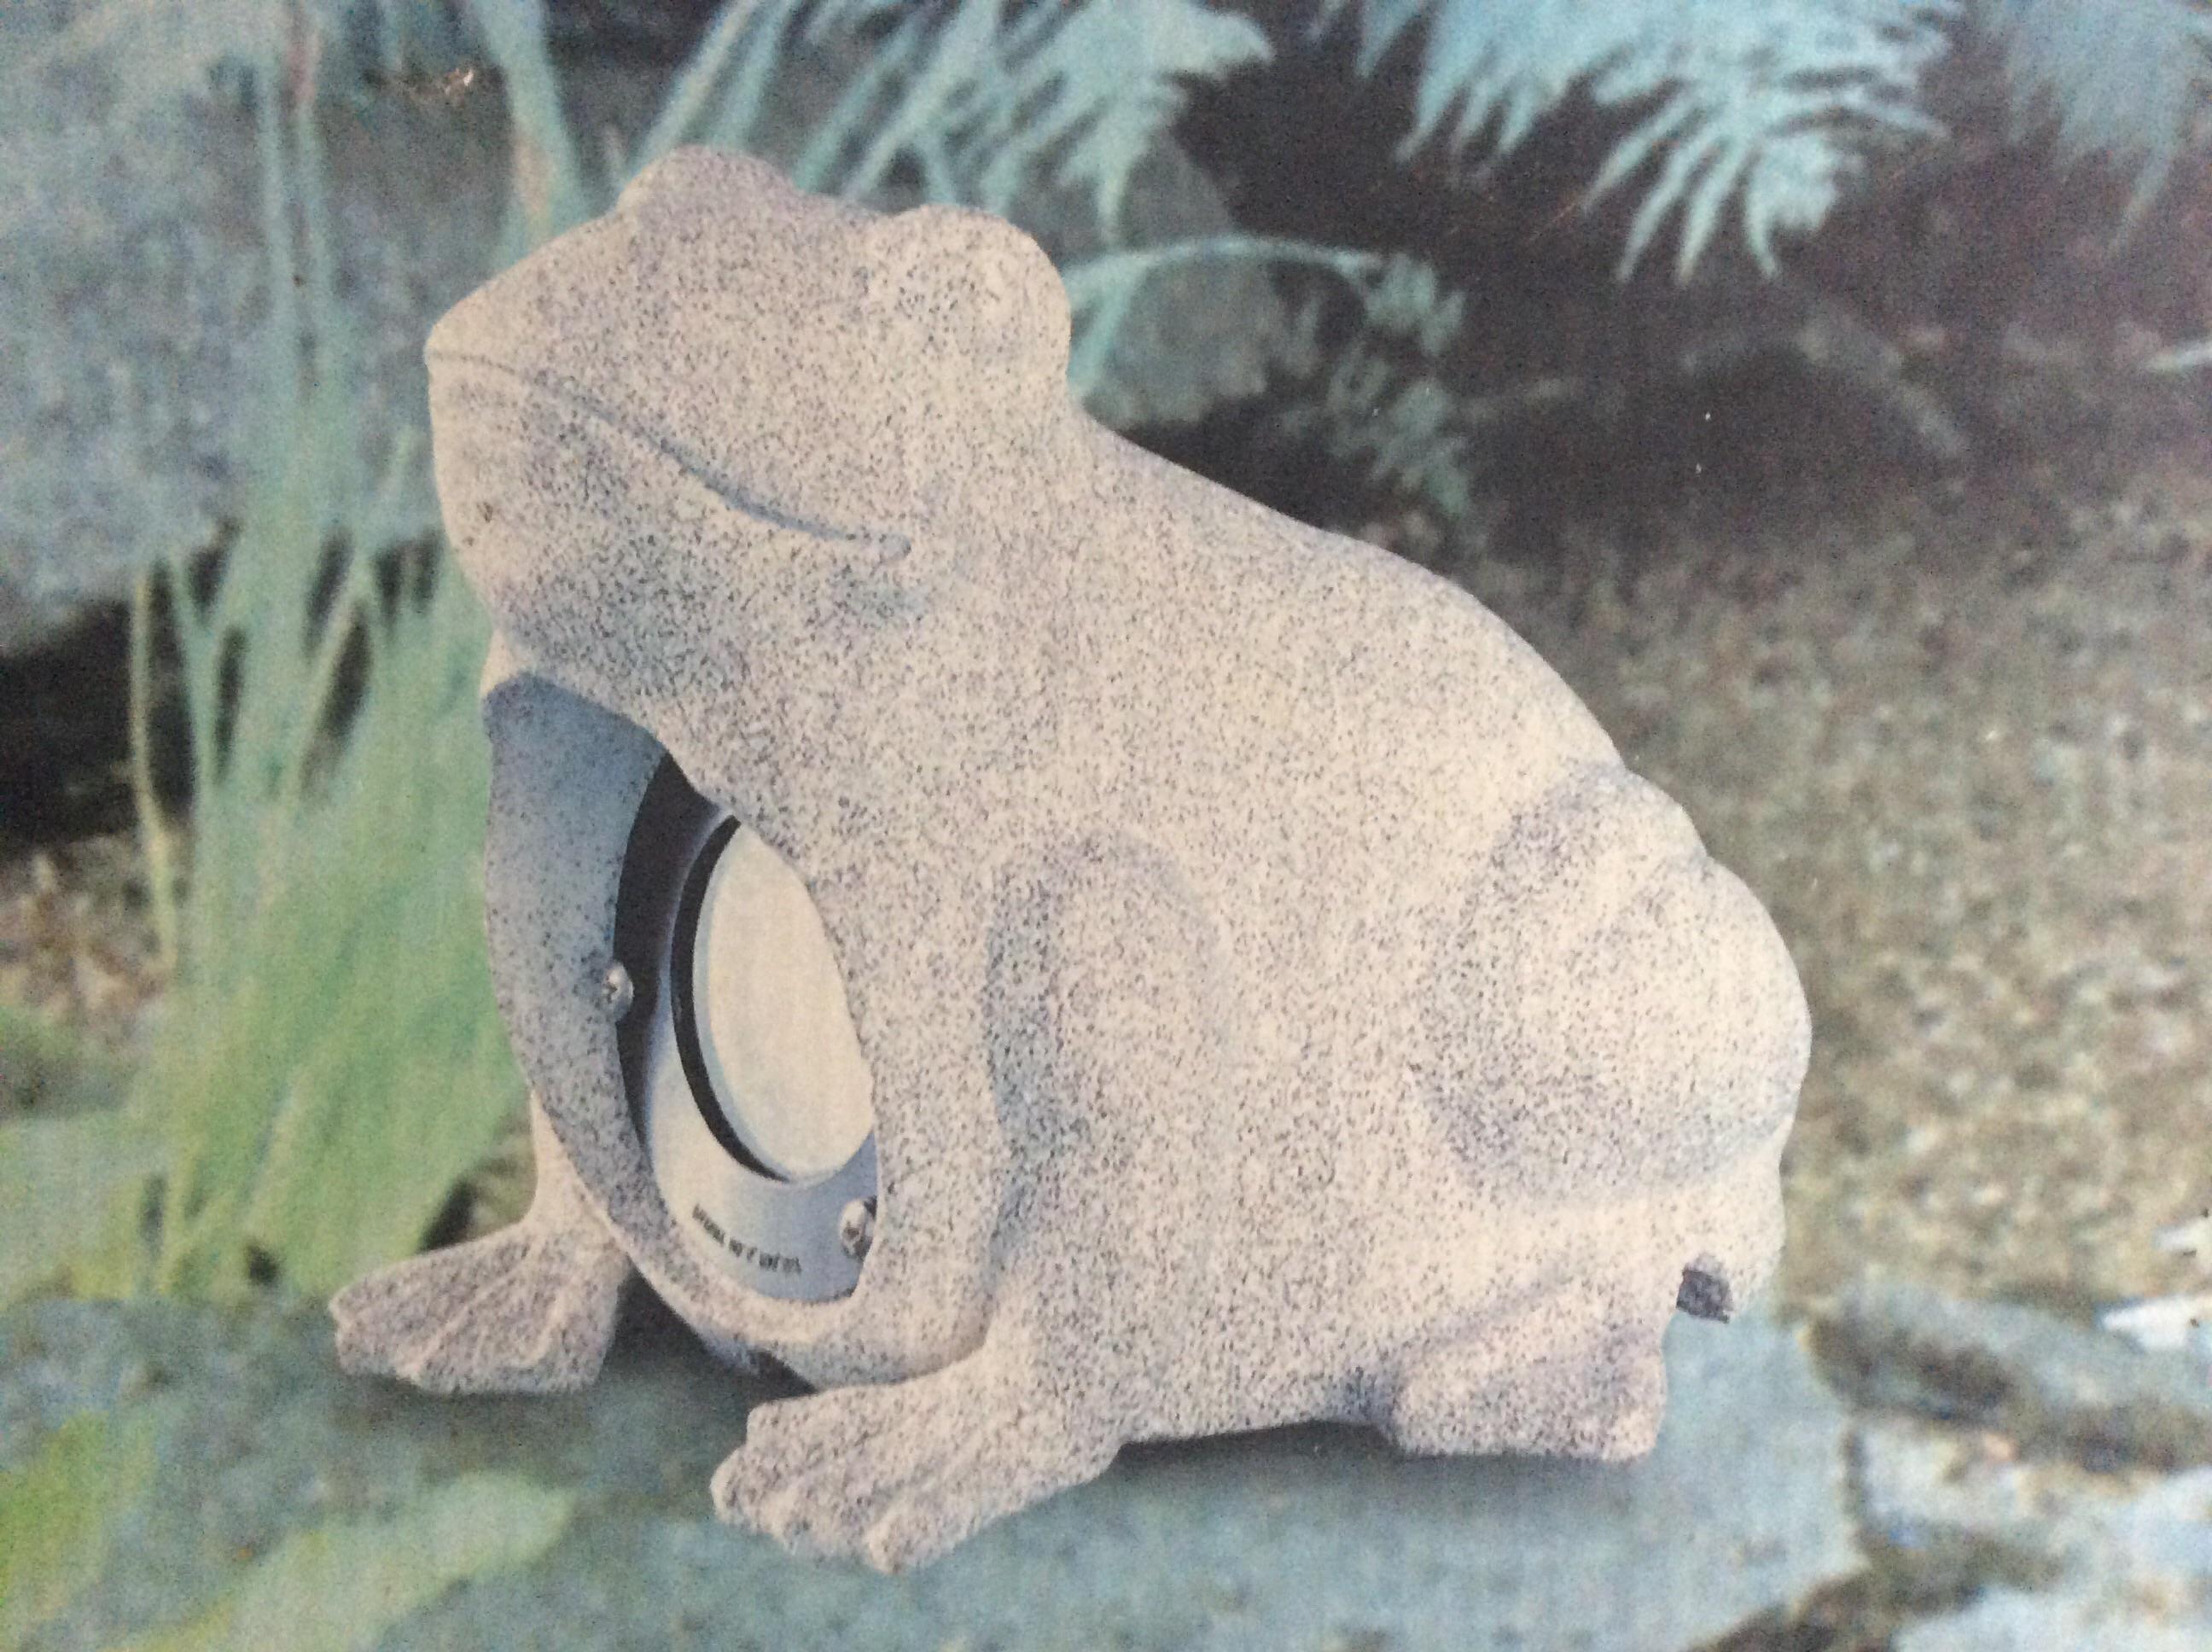 garten frosch mit beleuchtung elektronik haushalt. Black Bedroom Furniture Sets. Home Design Ideas